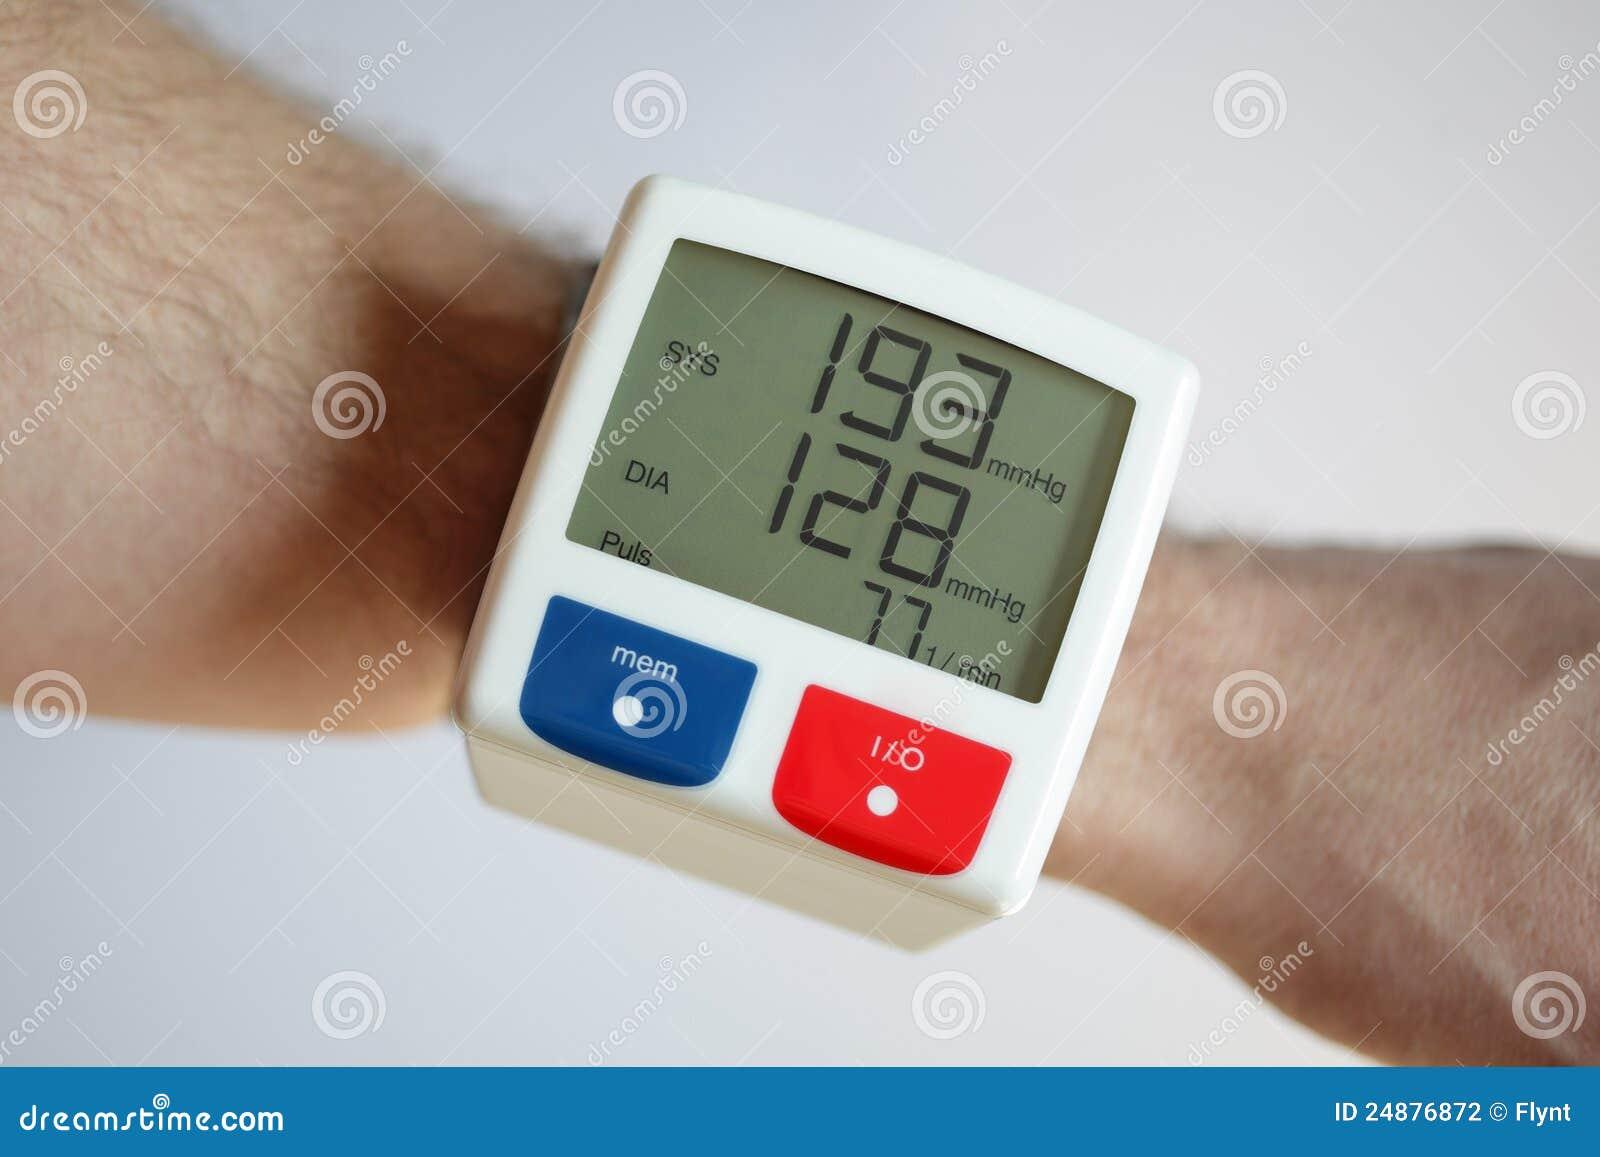 Hoher Blutdruck Stockfotografie - Bild: 24876872